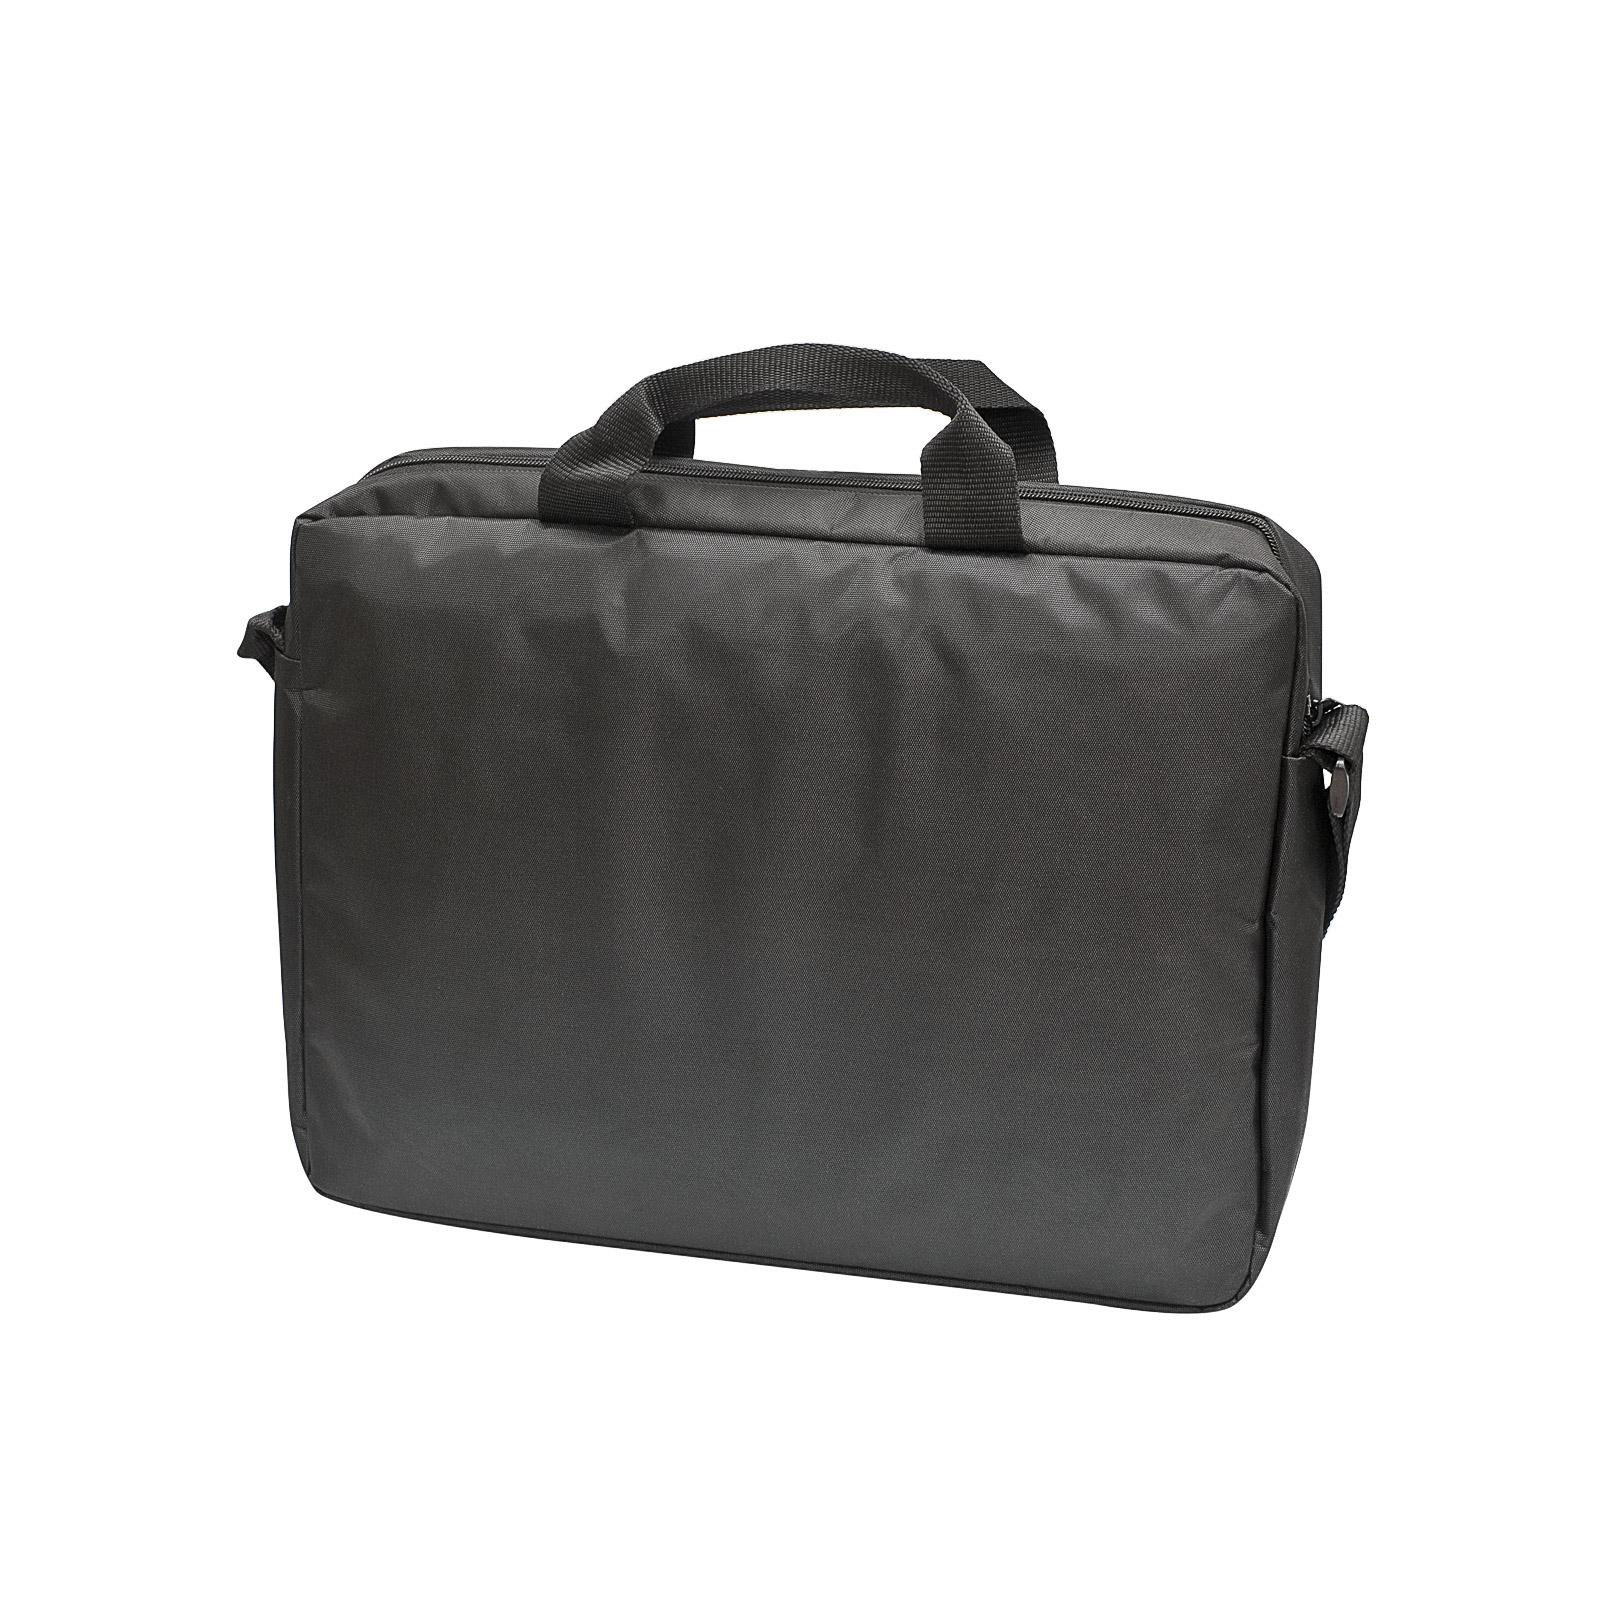 Сумка для ноутбука Grand-X 15.6'' Black (SB-120) изображение 2